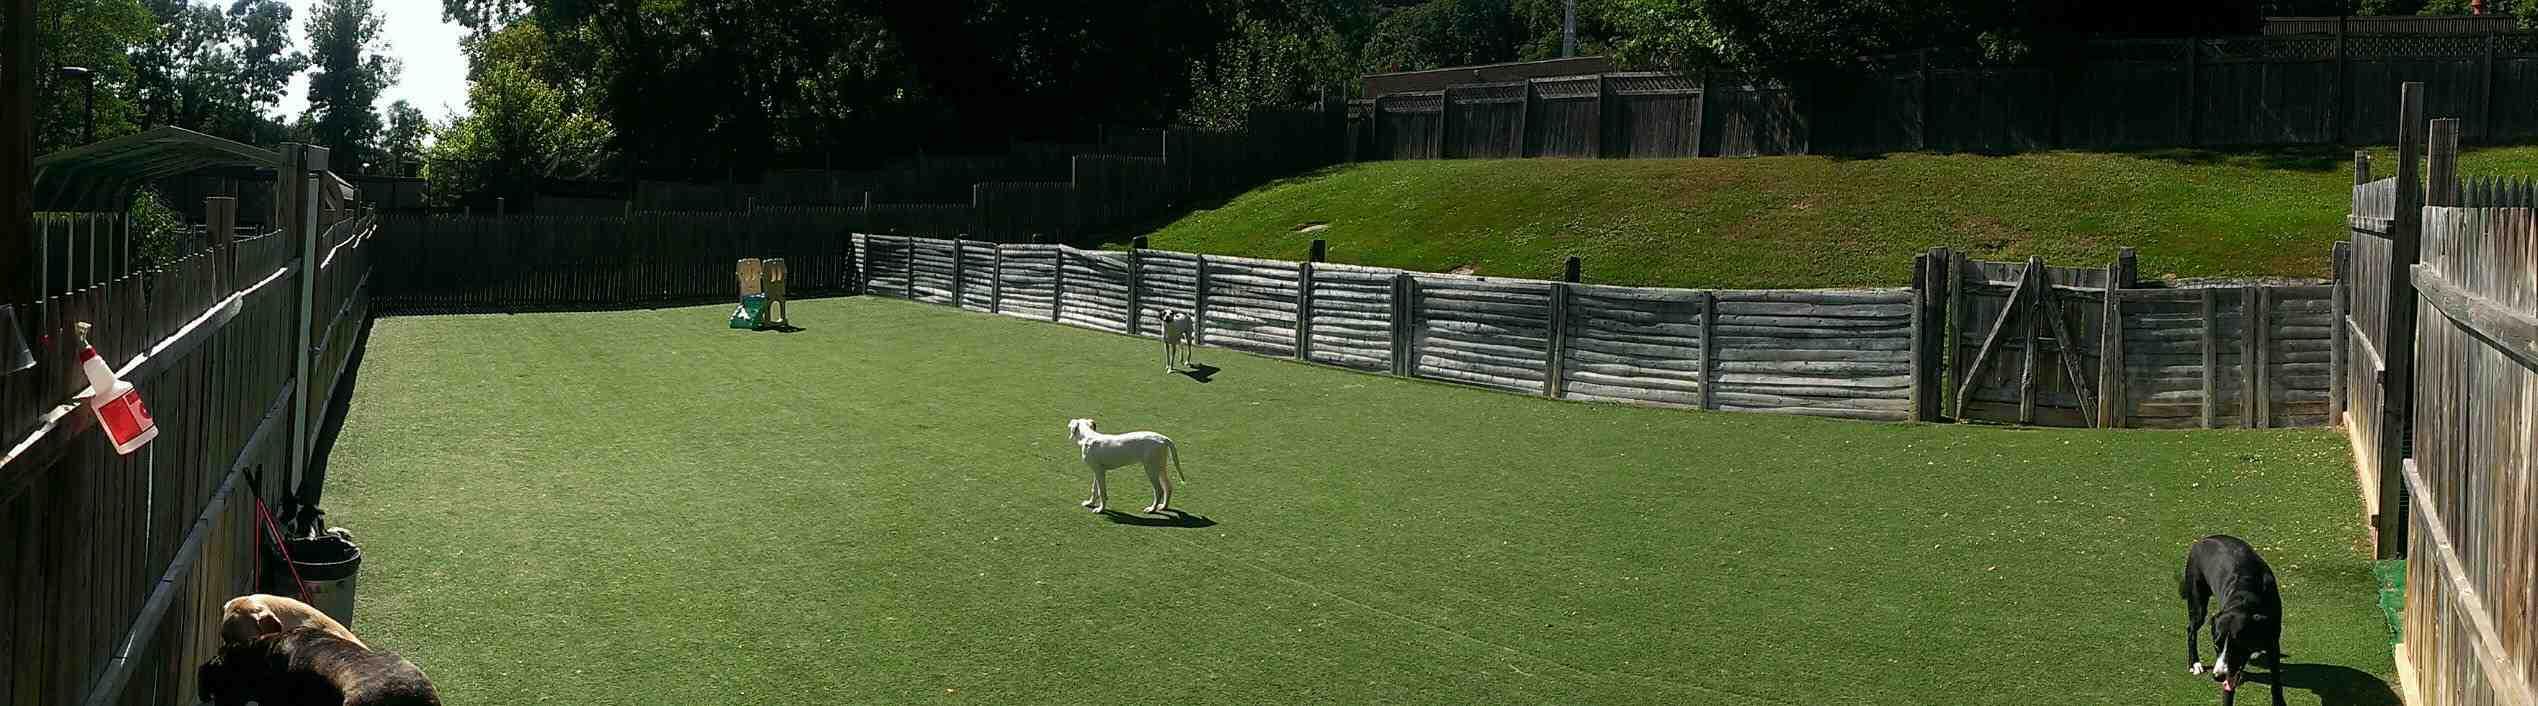 VCA Family Pet Resort image 5